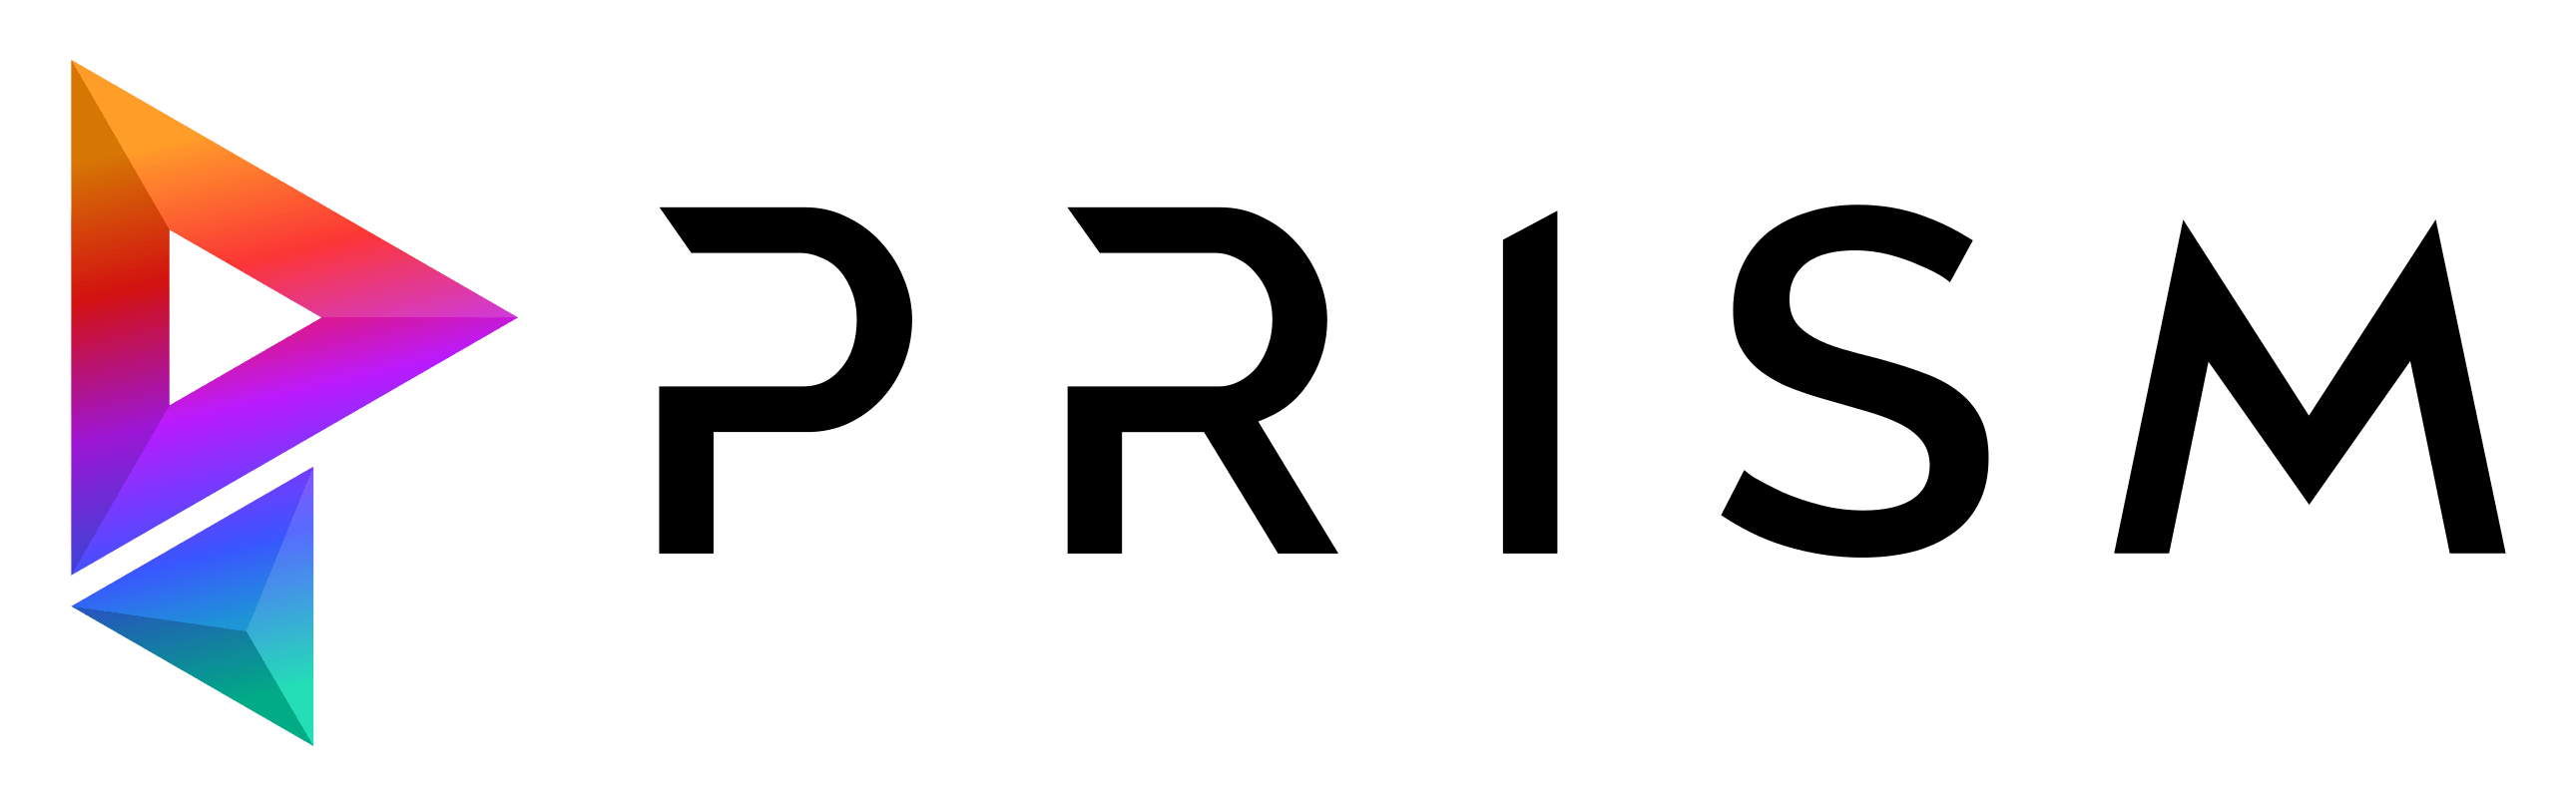 Prism-Pipeline